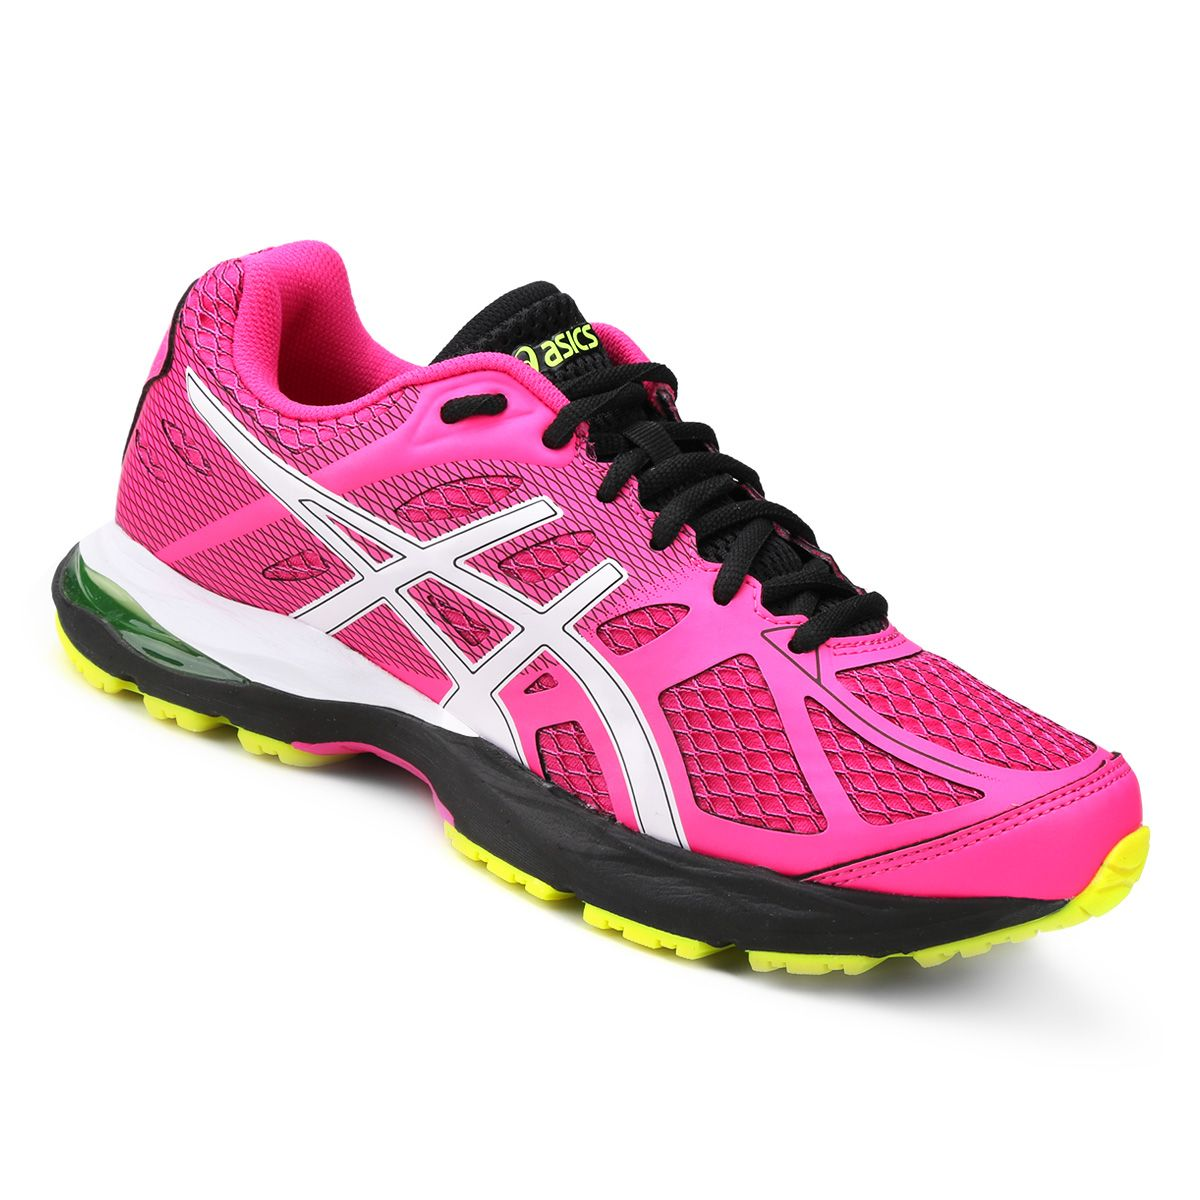 c8d4136d5 Tênis Asics Gel Spree Feminino - Pink e Branco